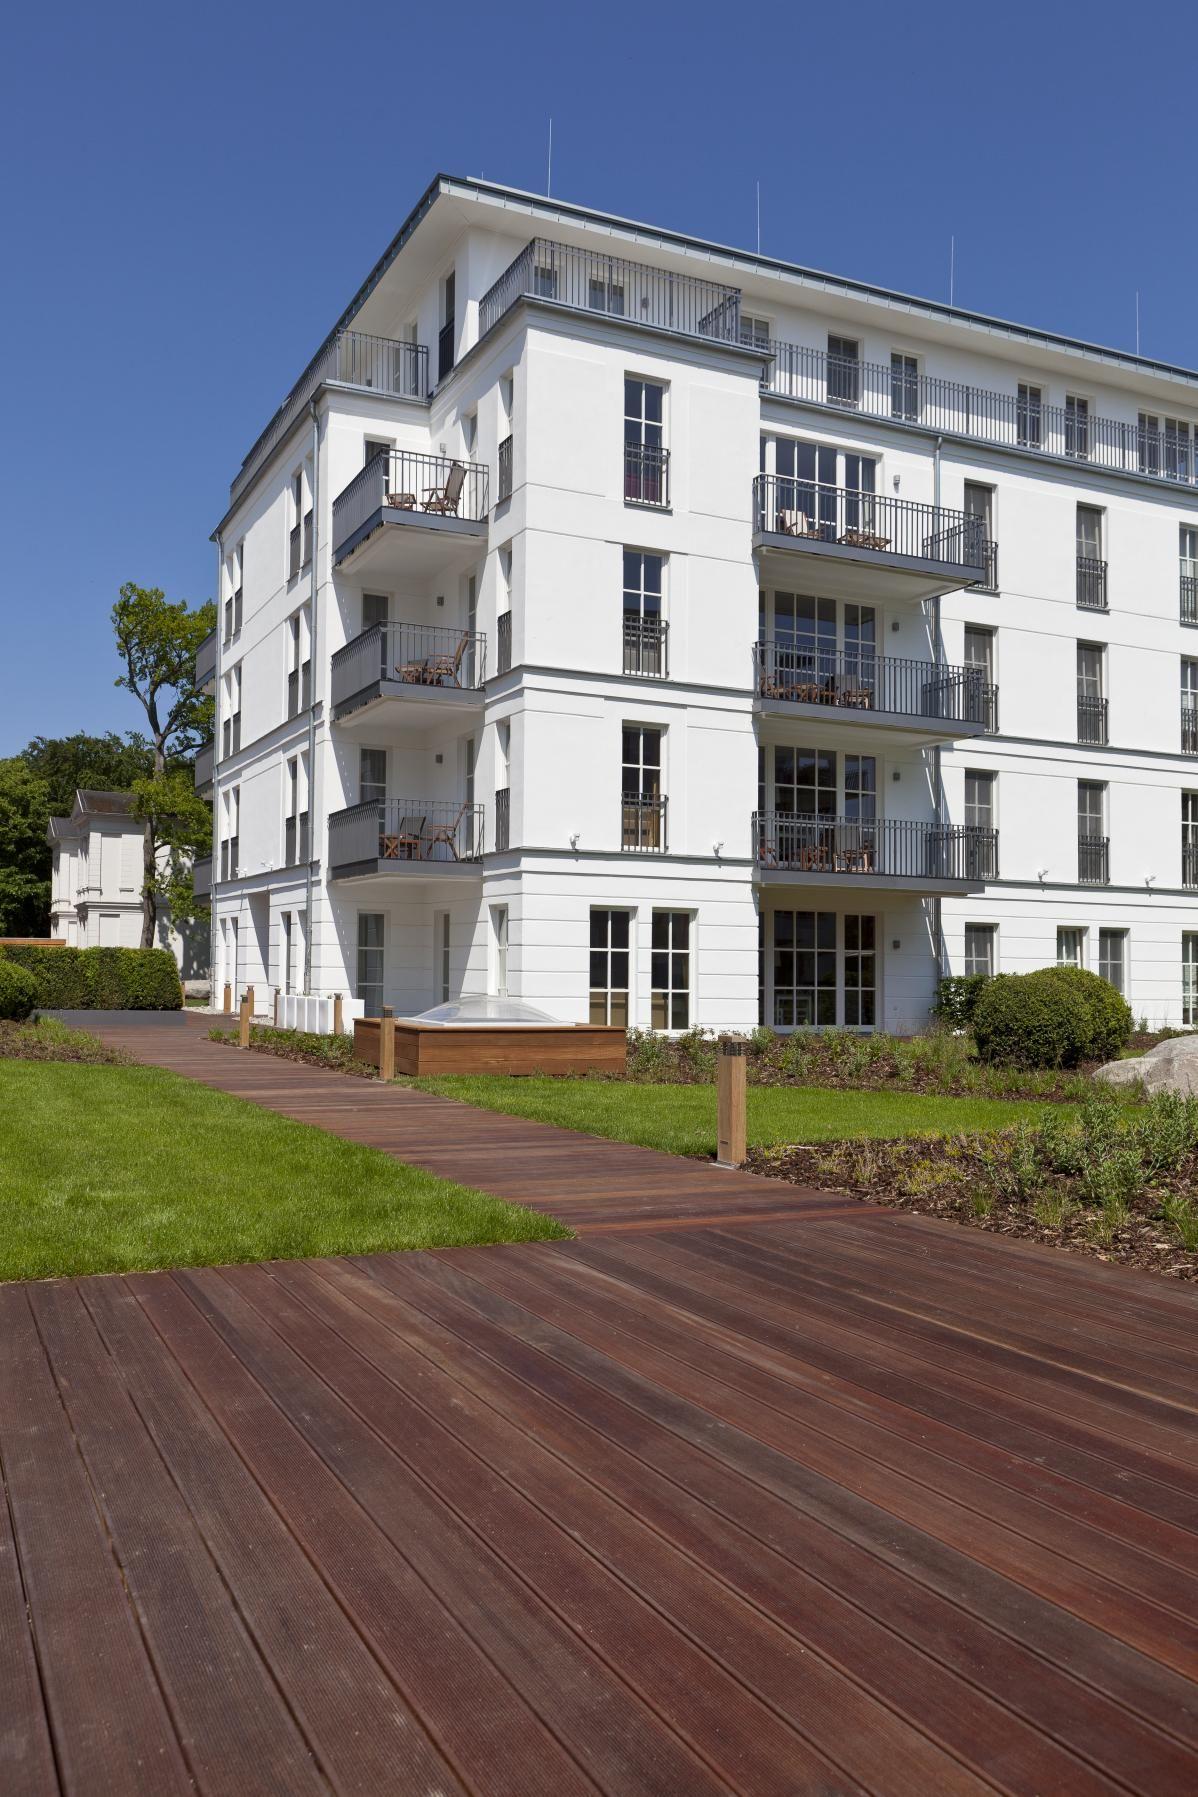 #Steigenberger Grandhotel and Spa, Heringsdorf/Usedom